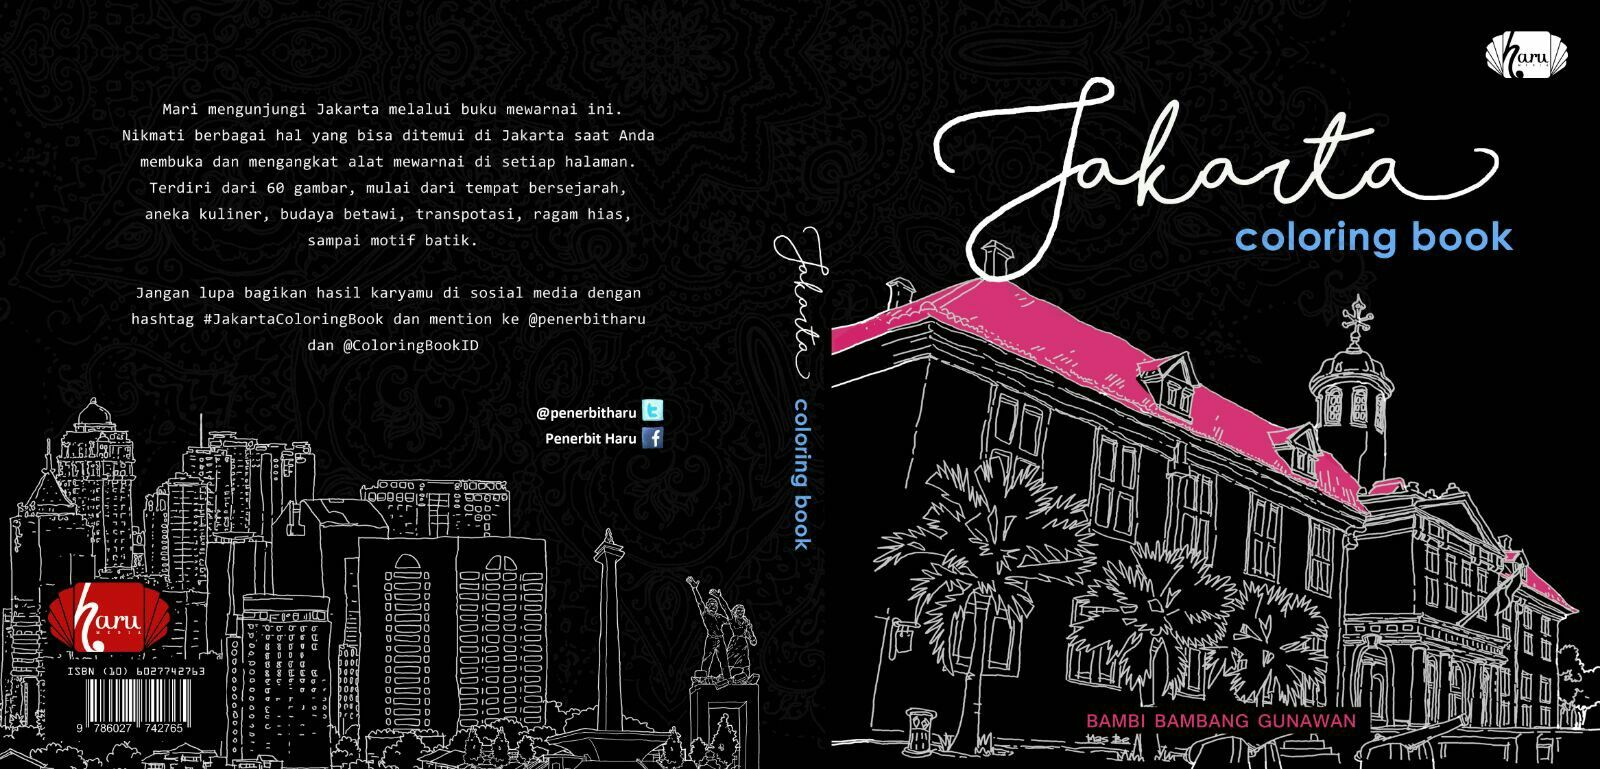 Menyambut Ultahjakarta Ke 489 Dapatkan JakartaColoringBook Di Gramedia Terdekat From Penerbitharu ColoringBookID